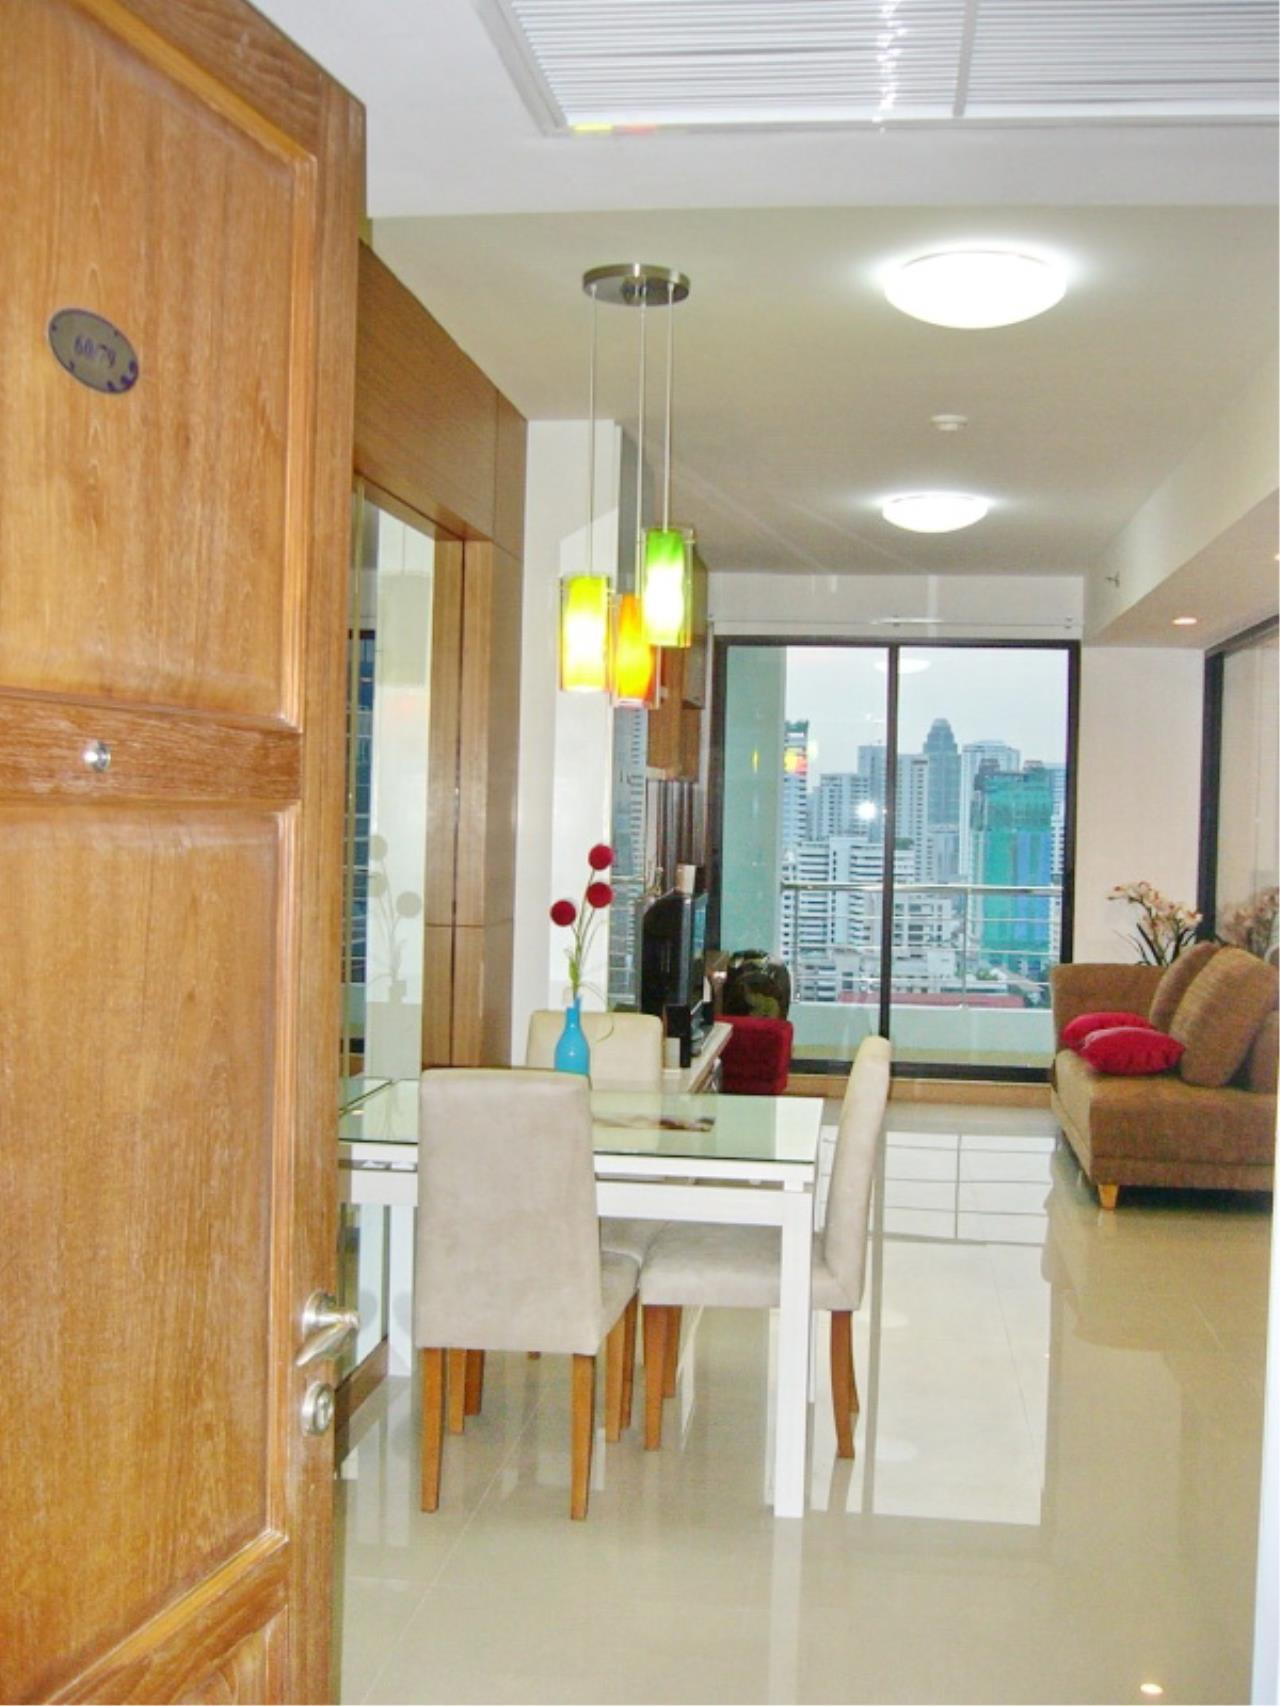 Agent - Mayteekul Sujirapinyokul Agency's AC4180418 For Rent Condo Supalai Premier Place Asoke Condo MRT Phetchaburi 3